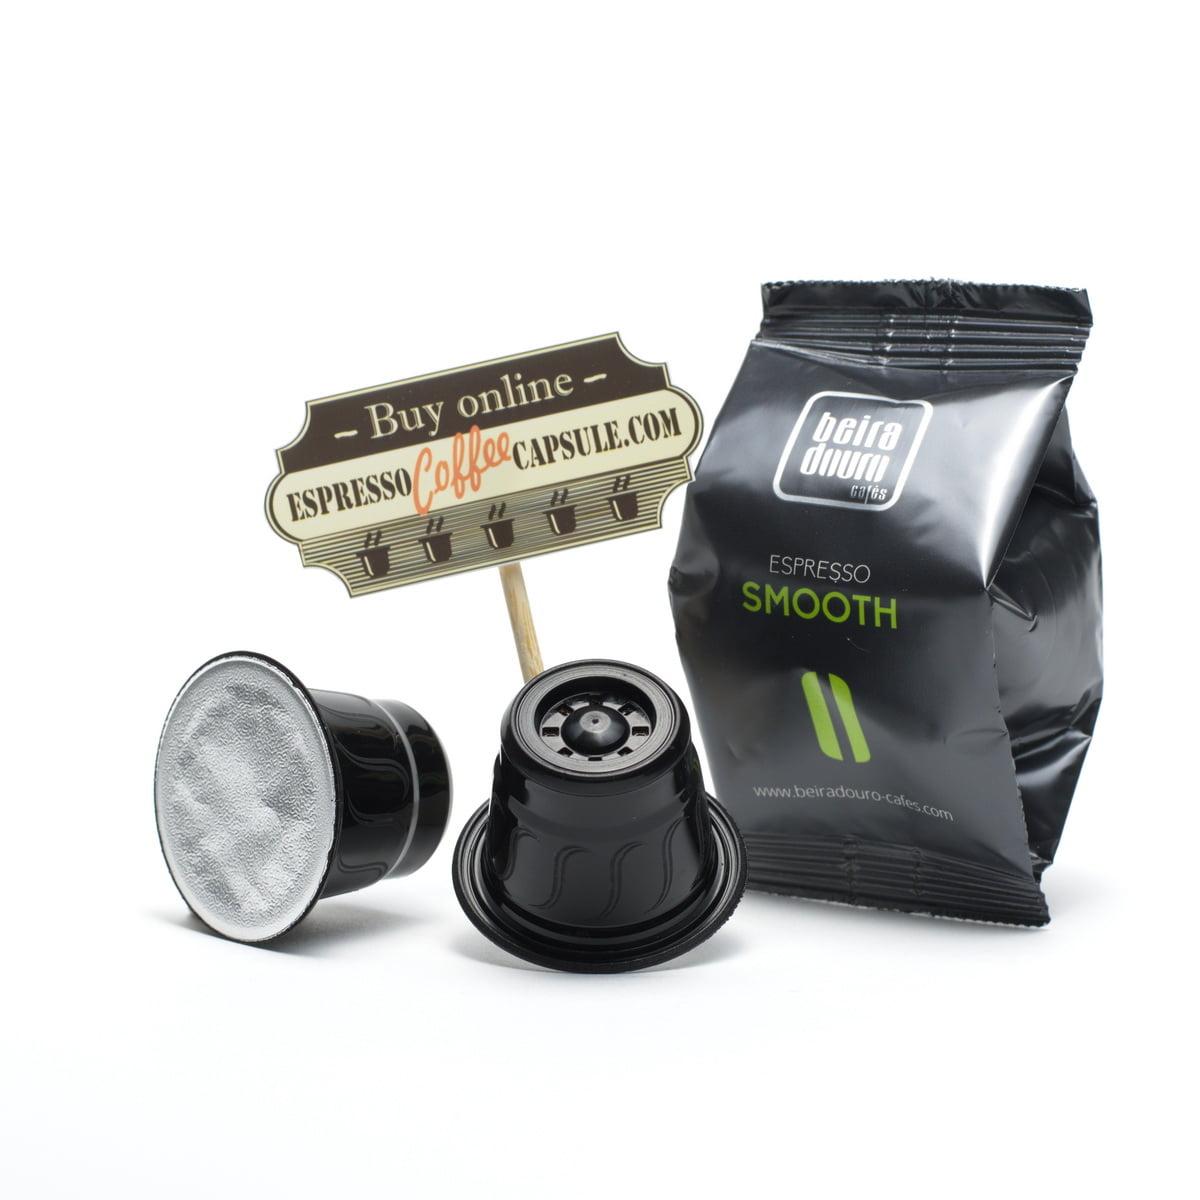 Вeira Douro Smooth Capsule • EspressoCoffeeCapsule.com